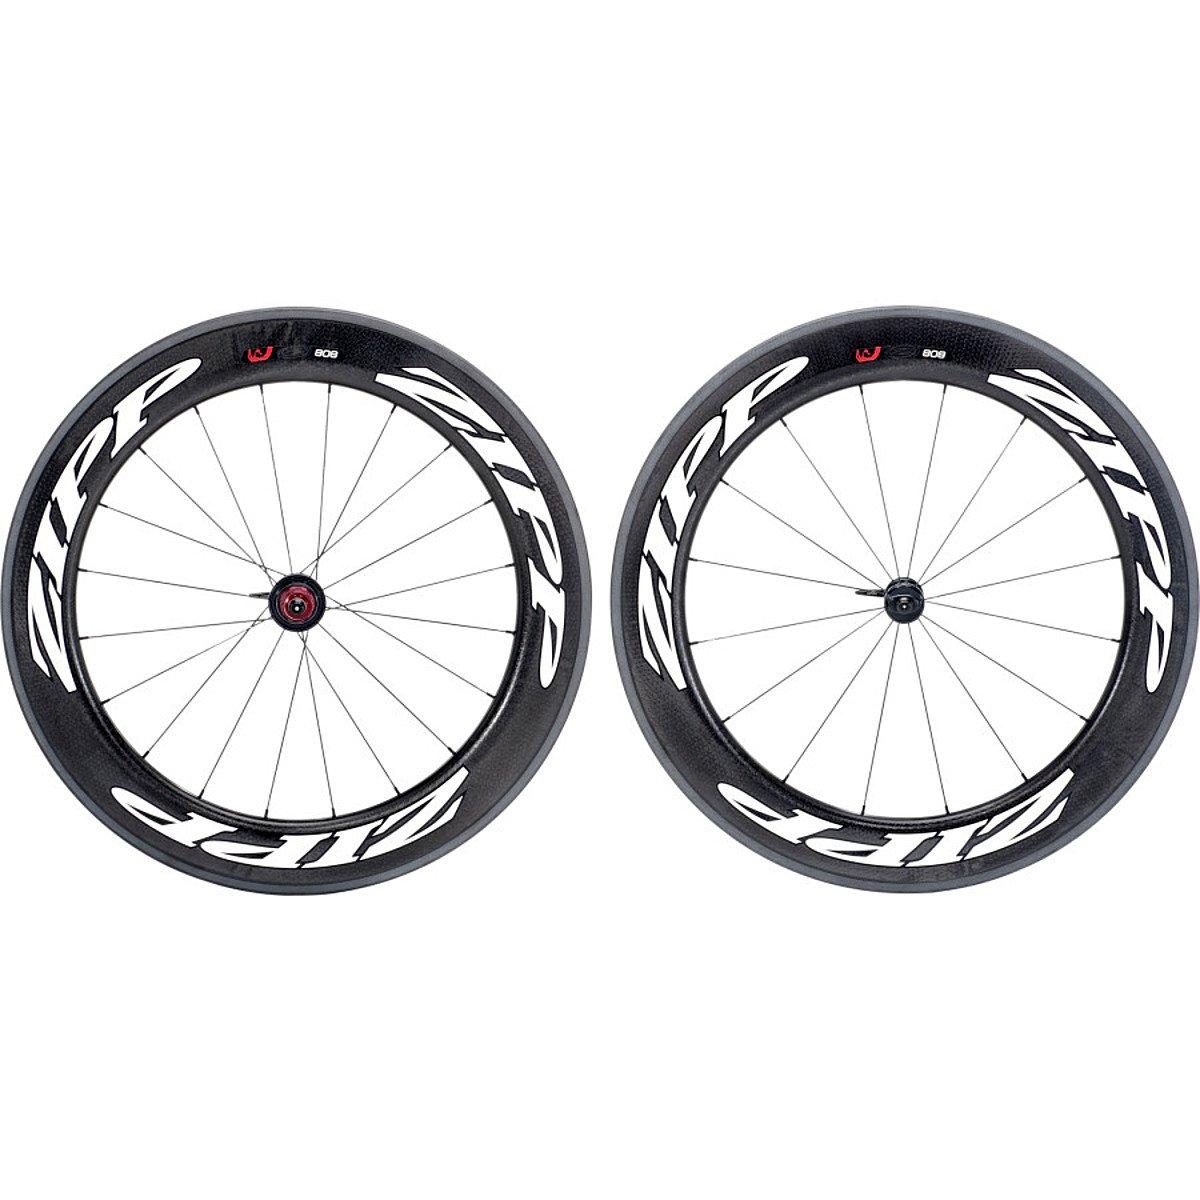 Zipp FC AV Decal 808 Roue pneu Blanc B00FOOI3HO